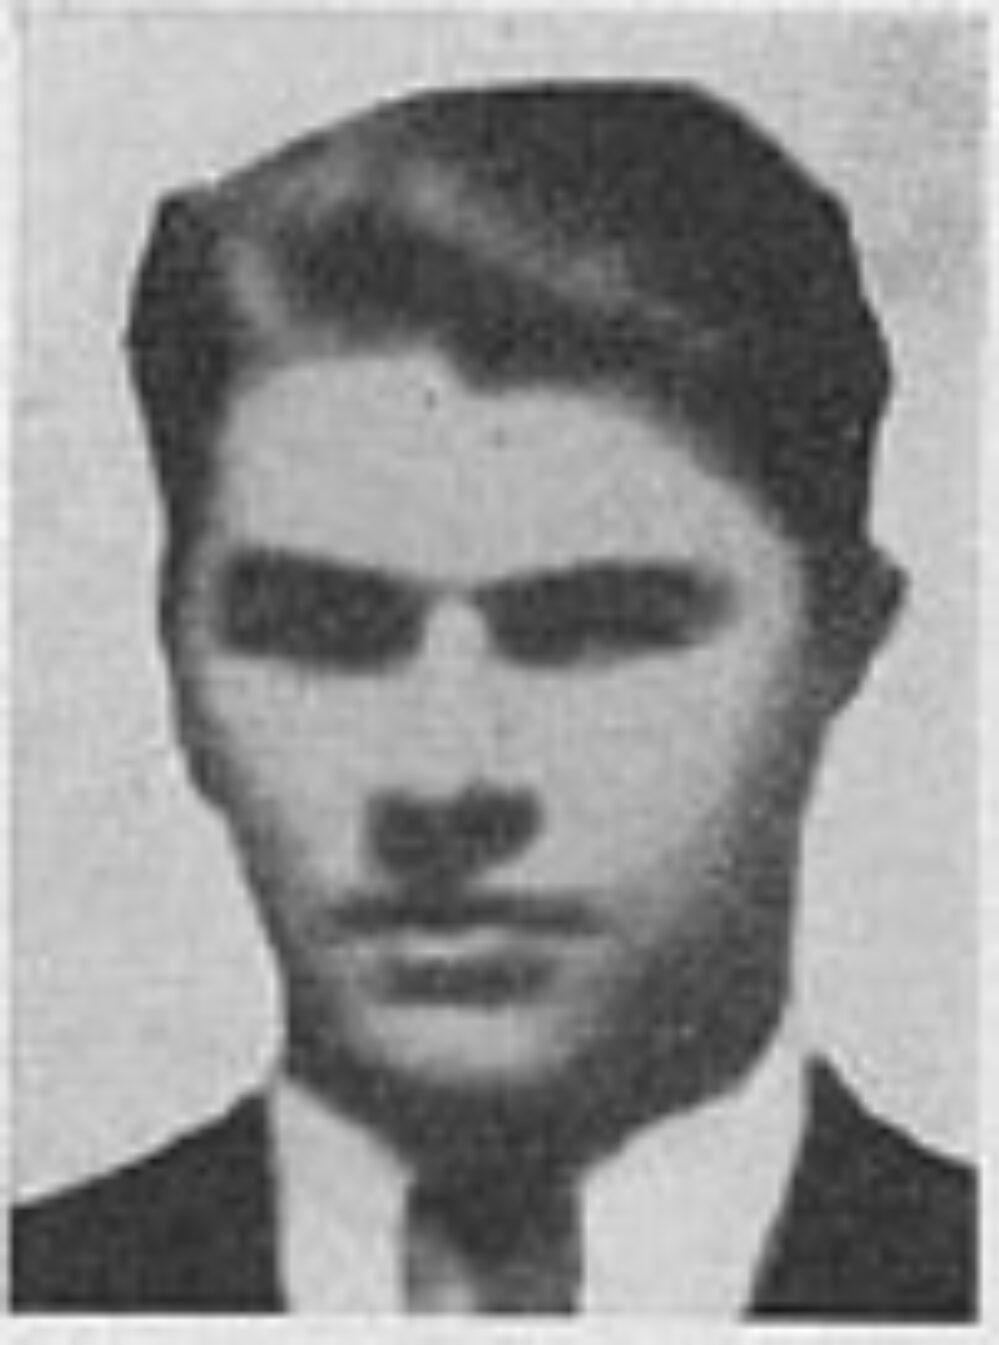 Olaf Larsen Brevik